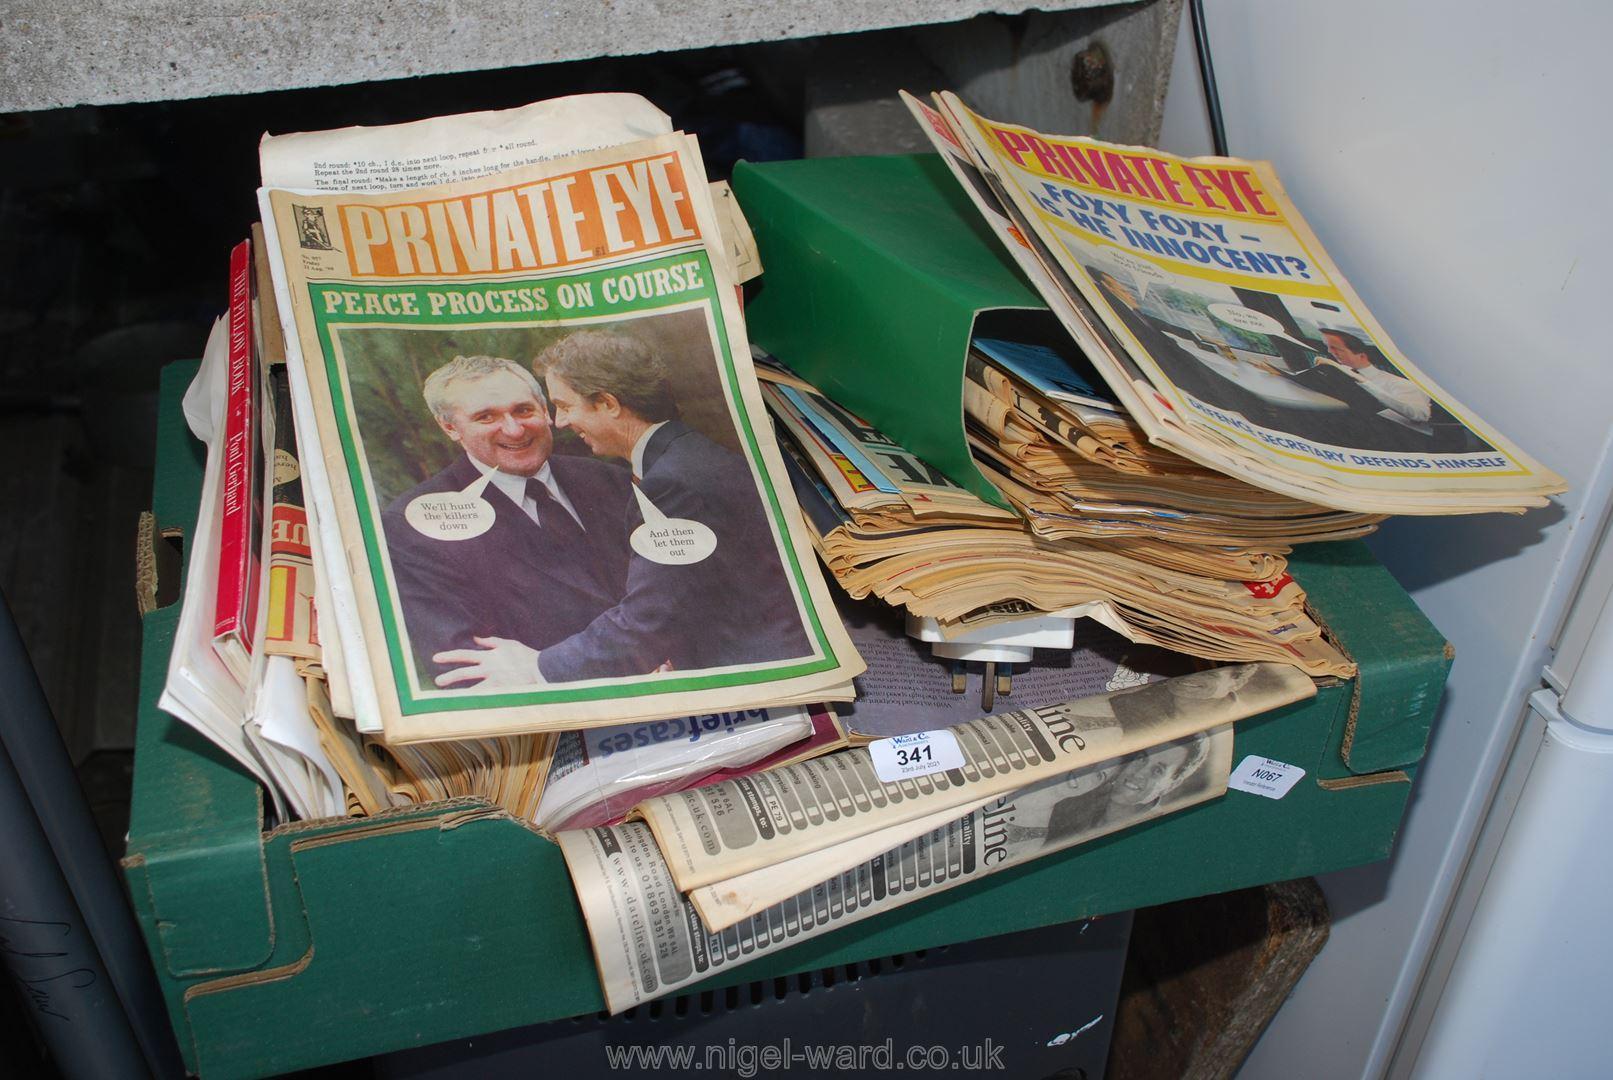 Quantity of Private Eye magazines